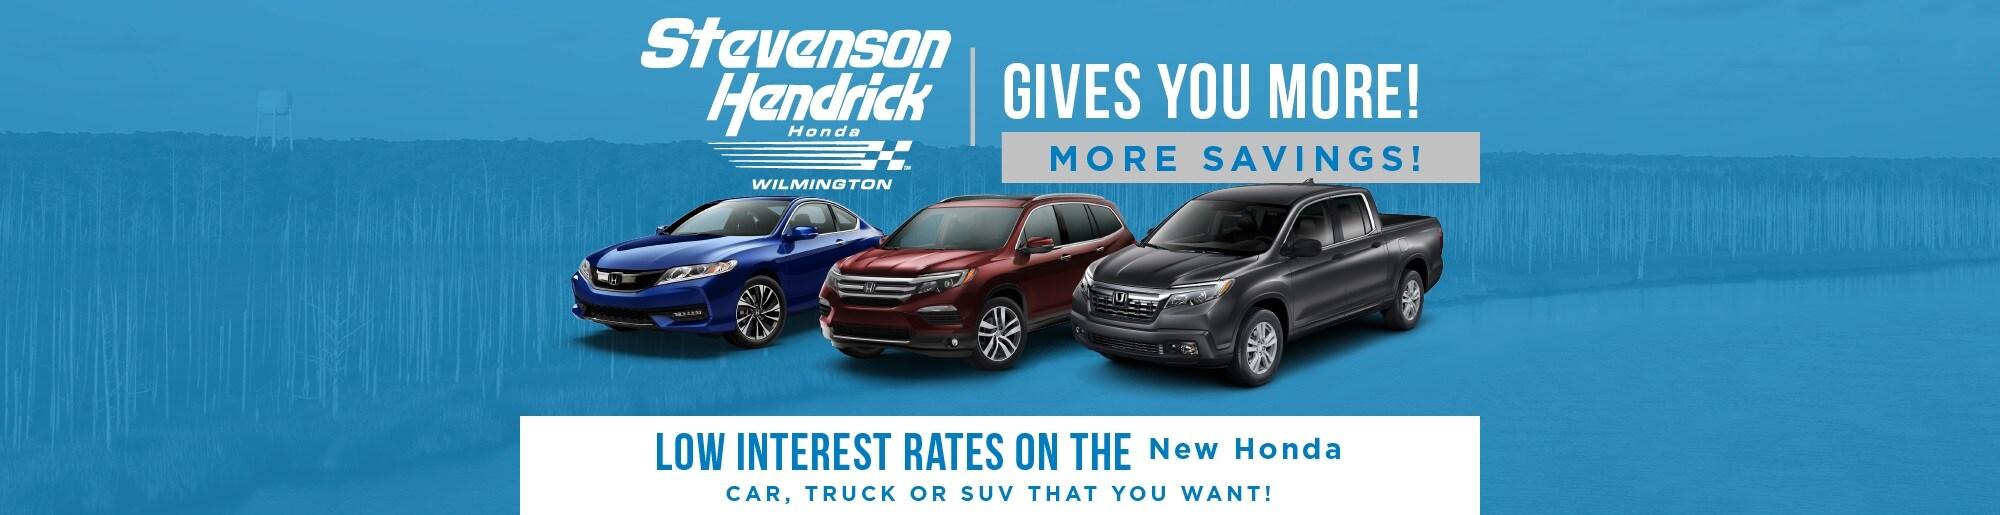 Stevenson Hendrick Honda Wilmington New Dealer Near Jacksonville The Toyota Landcruiser Owners Club View Topic Blue Plug Previous Next